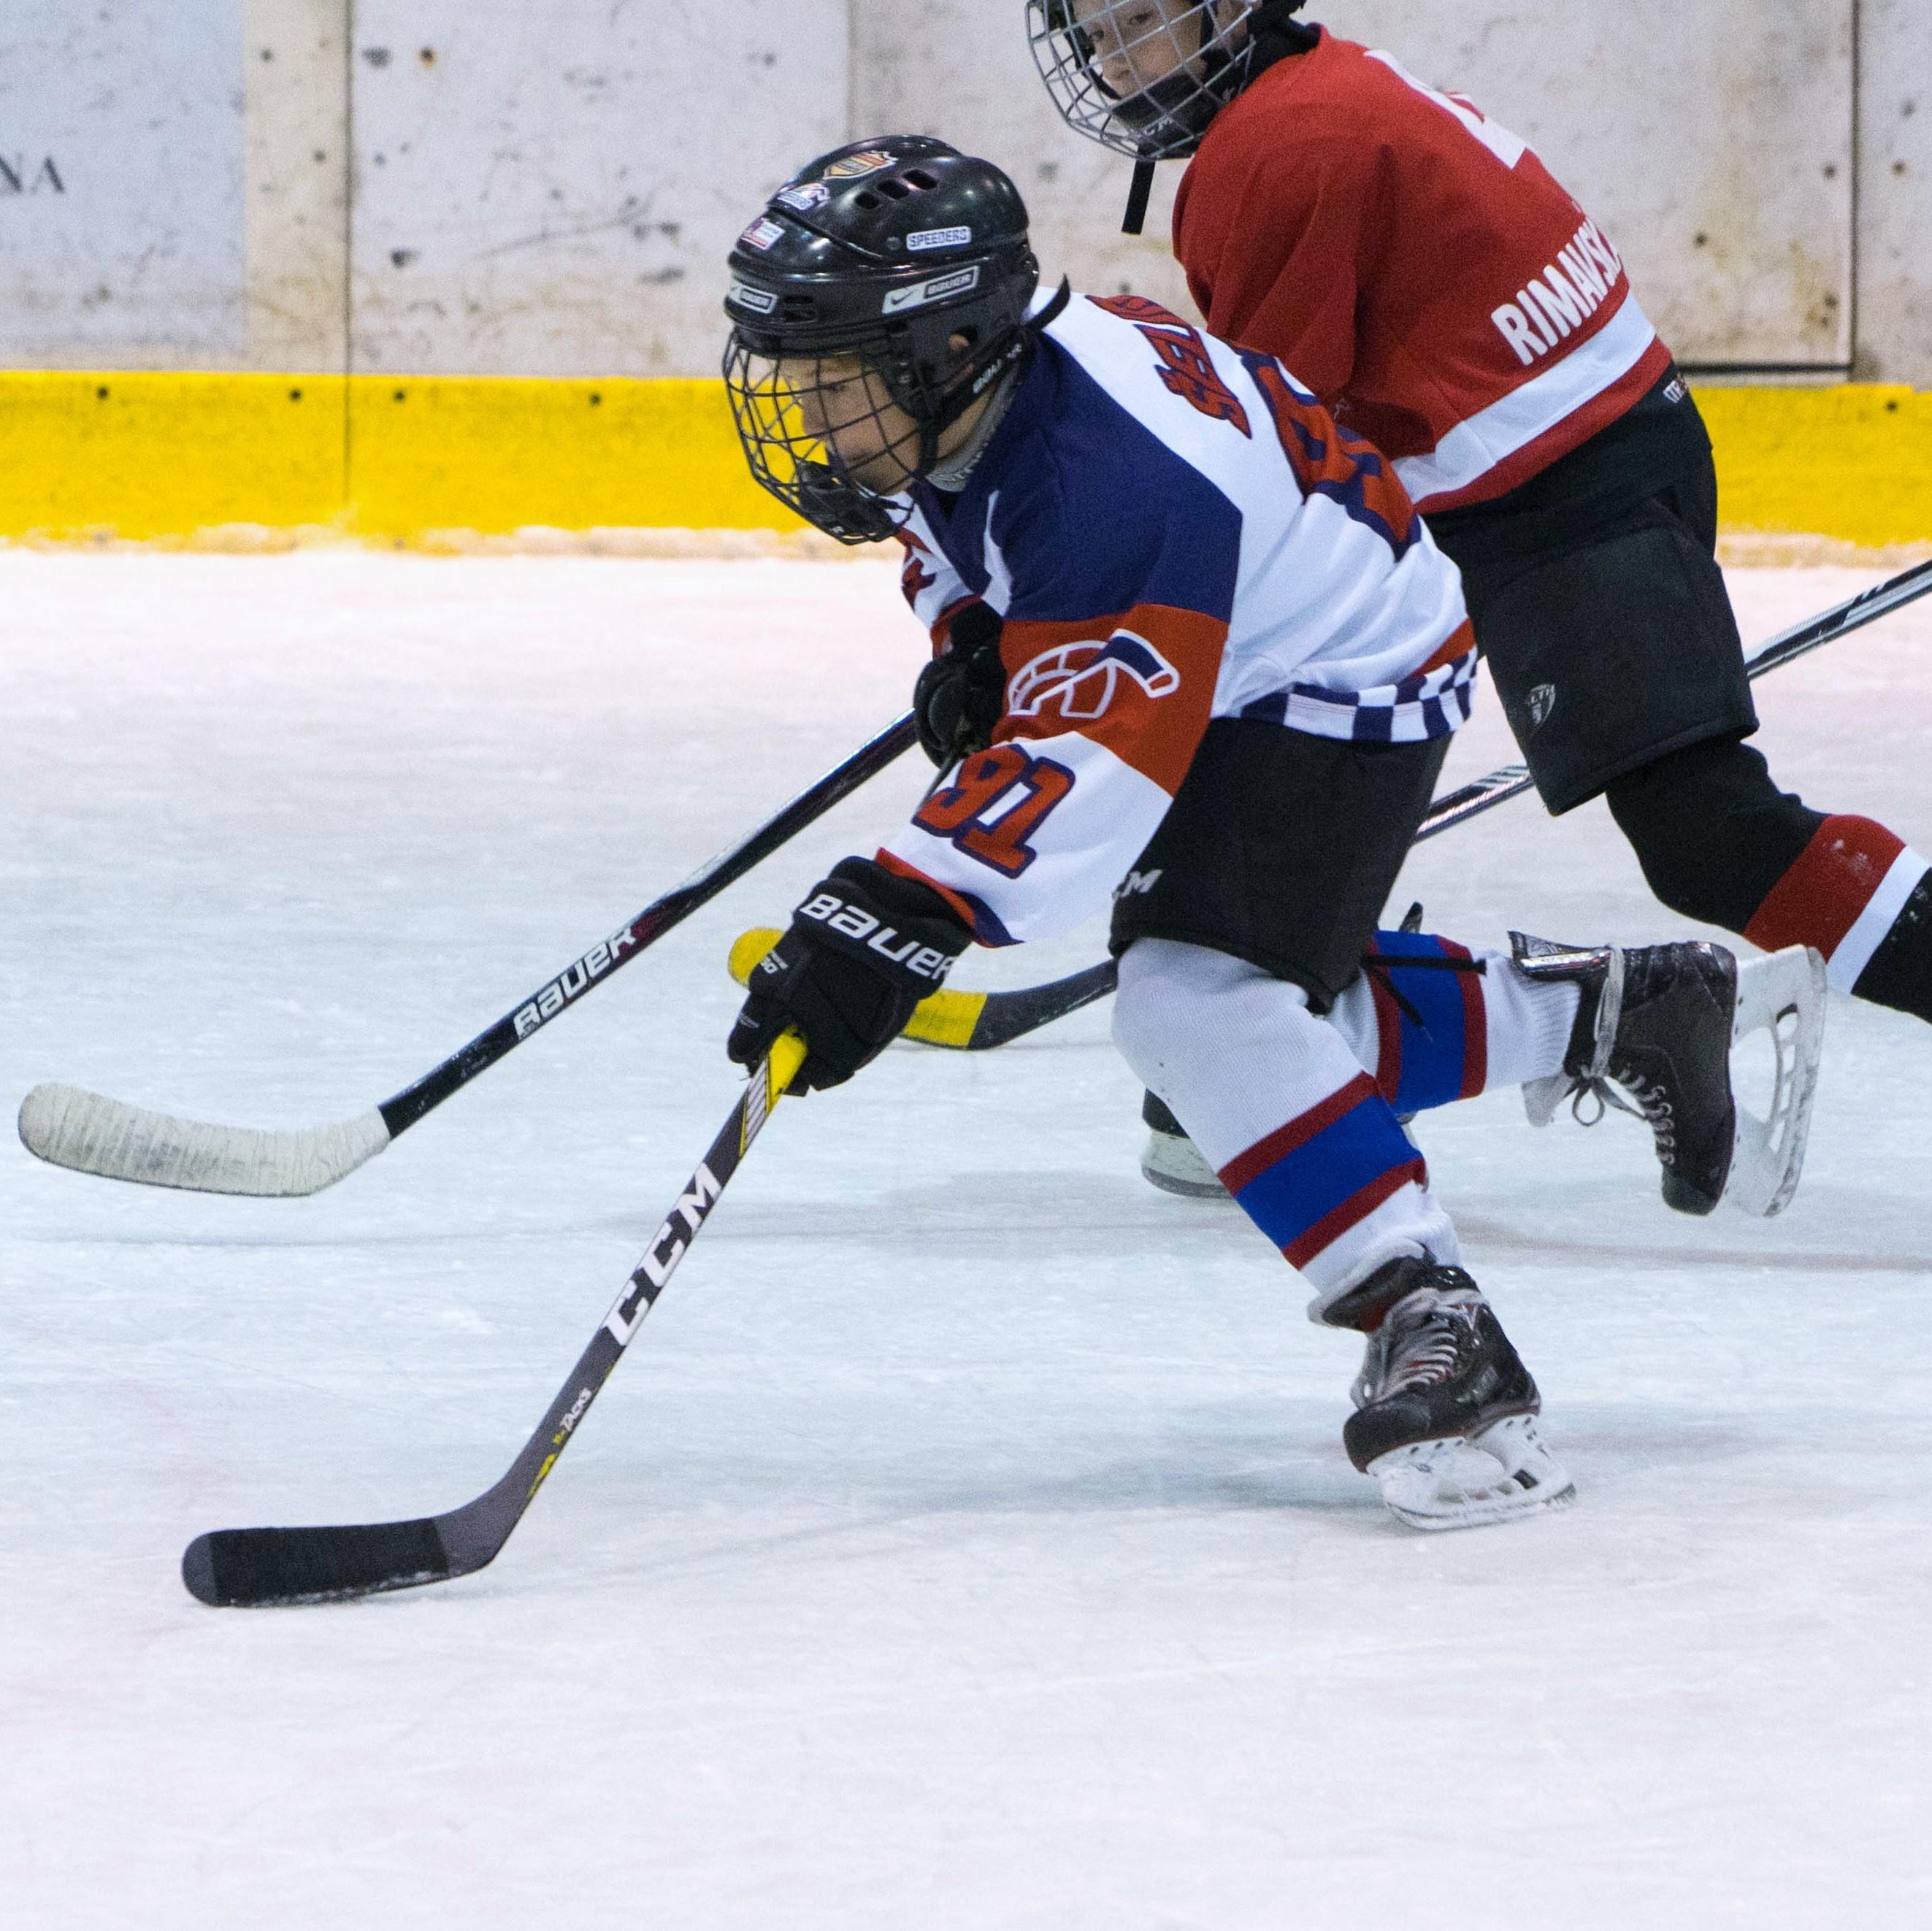 Speeders_sezona 2018_19 hokej turnaj lucenec 3